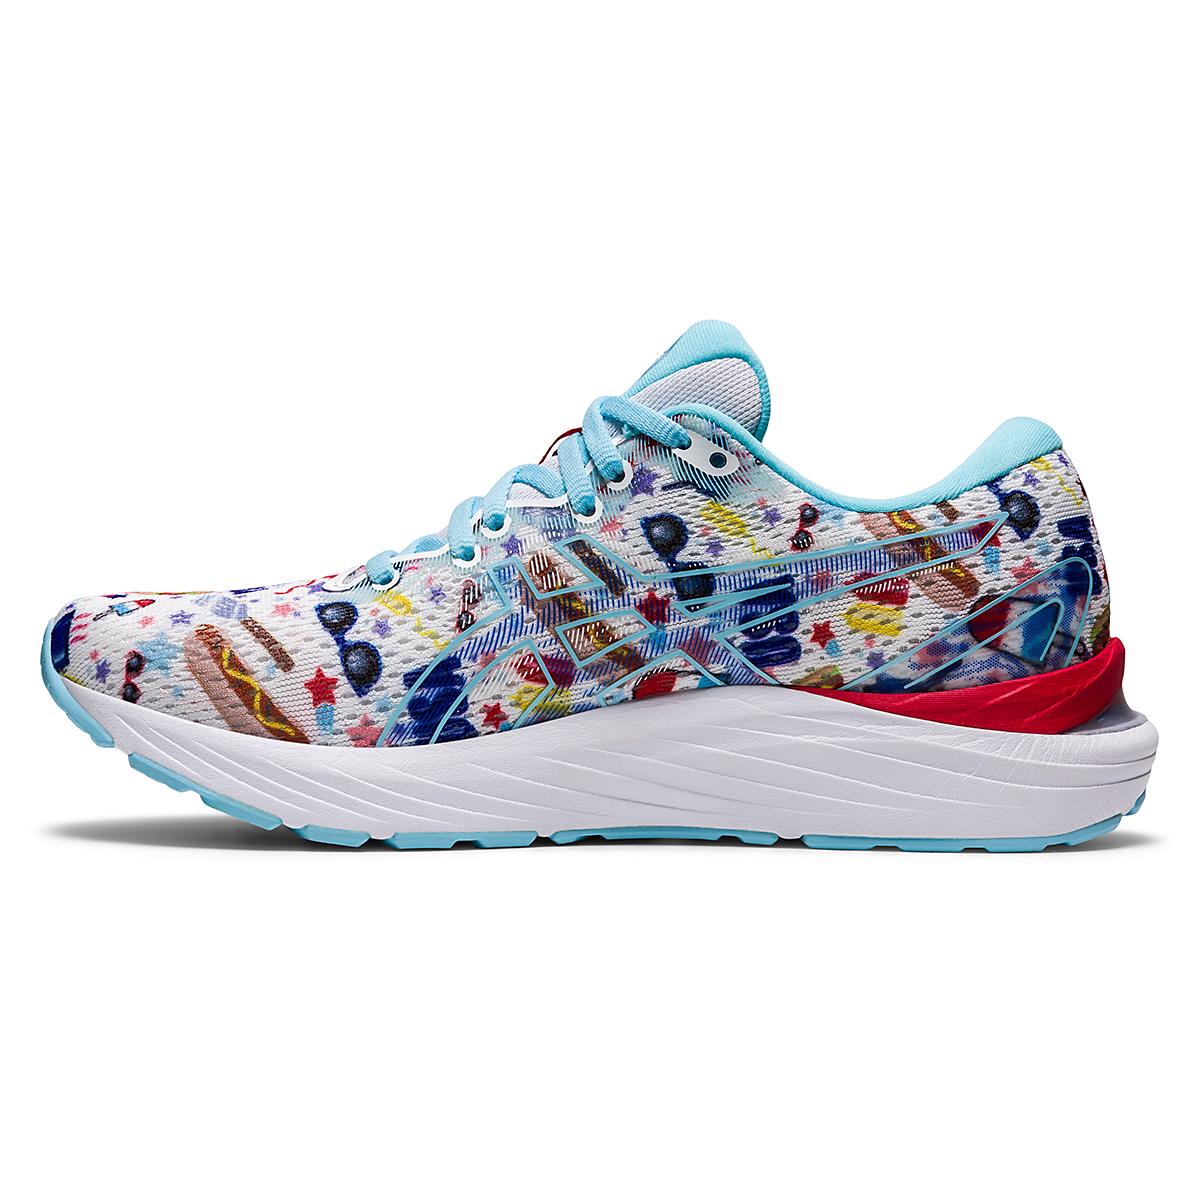 Women's Asics Gel-Cumulus 23 Cookout Running Shoe - Color: White/Asics Blue - Size: 5 - Width: Regular, White/Asics Blue, large, image 2